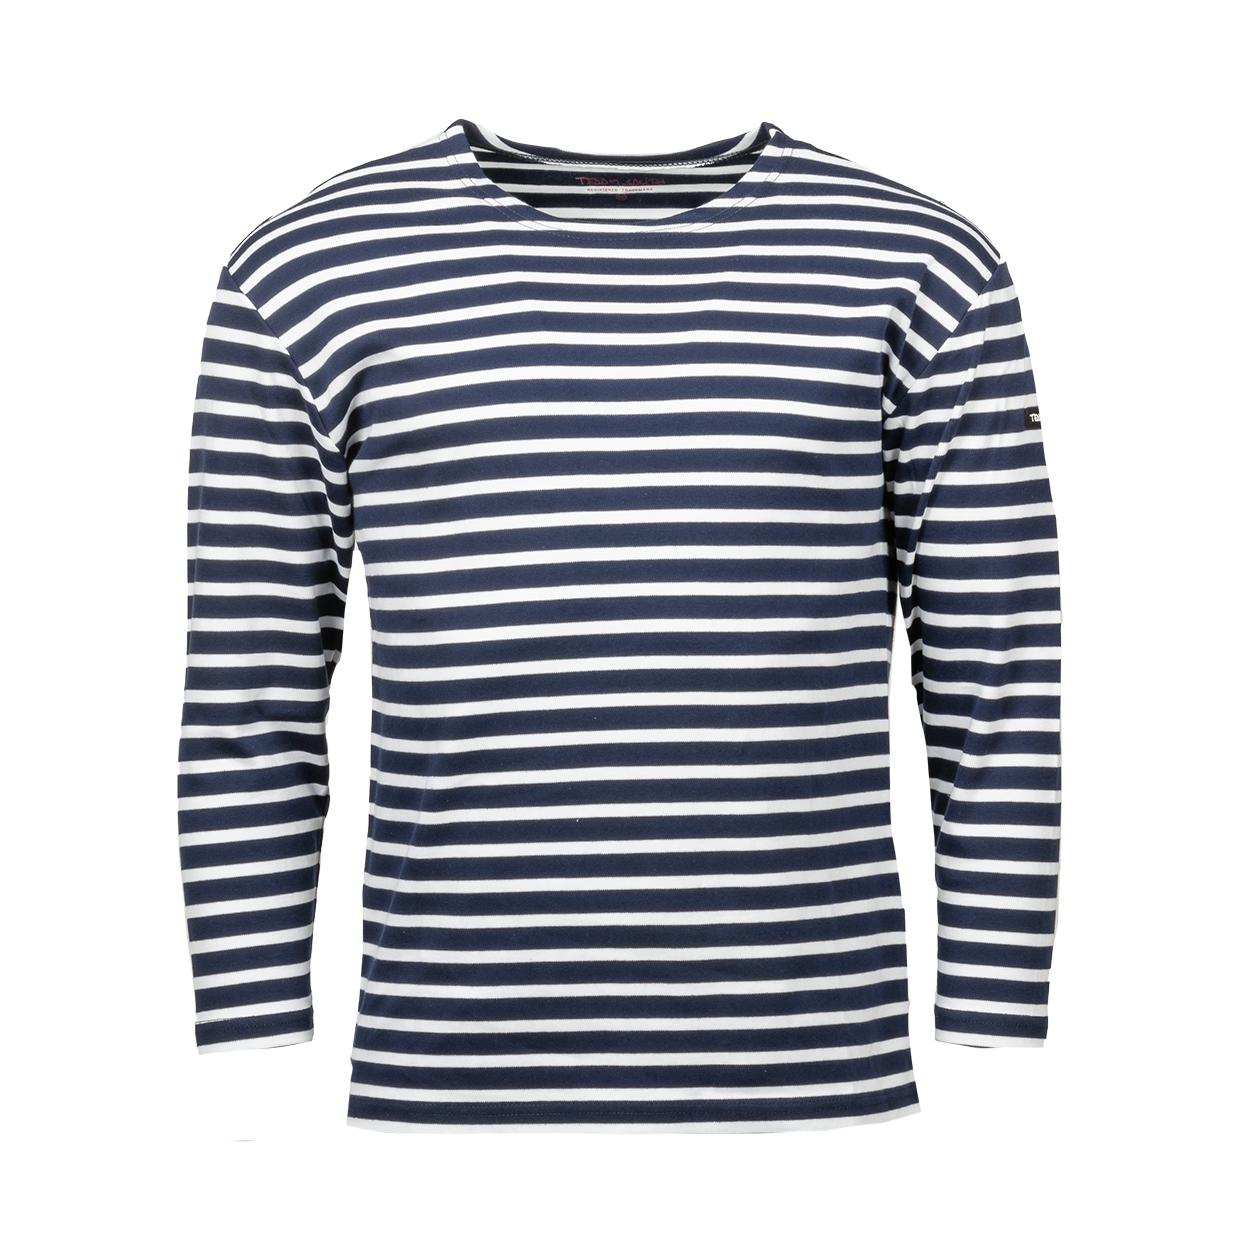 Tee-shirt manches longues Teddy Smith T-Ocean en coton bleu marine à rayures blanches